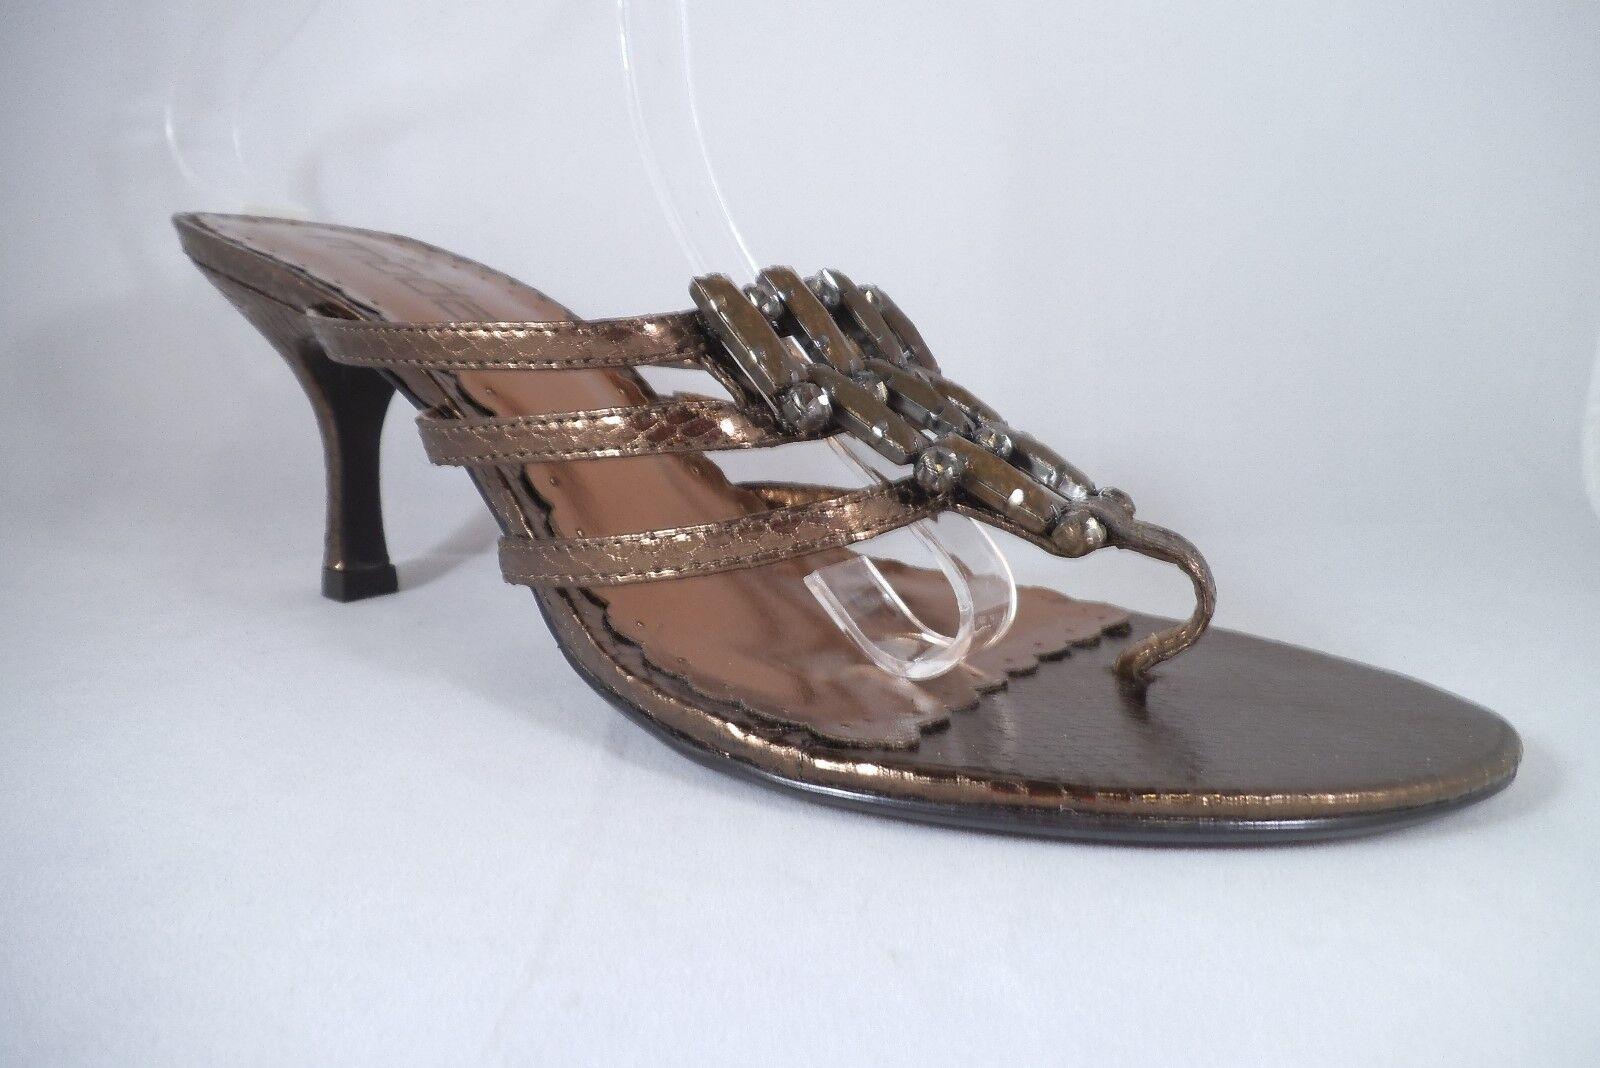 Nuevo Moda Spana Sandalia M de cobre Brillo Con Cuentas Tanga Elegante Tacones Cocodrilo